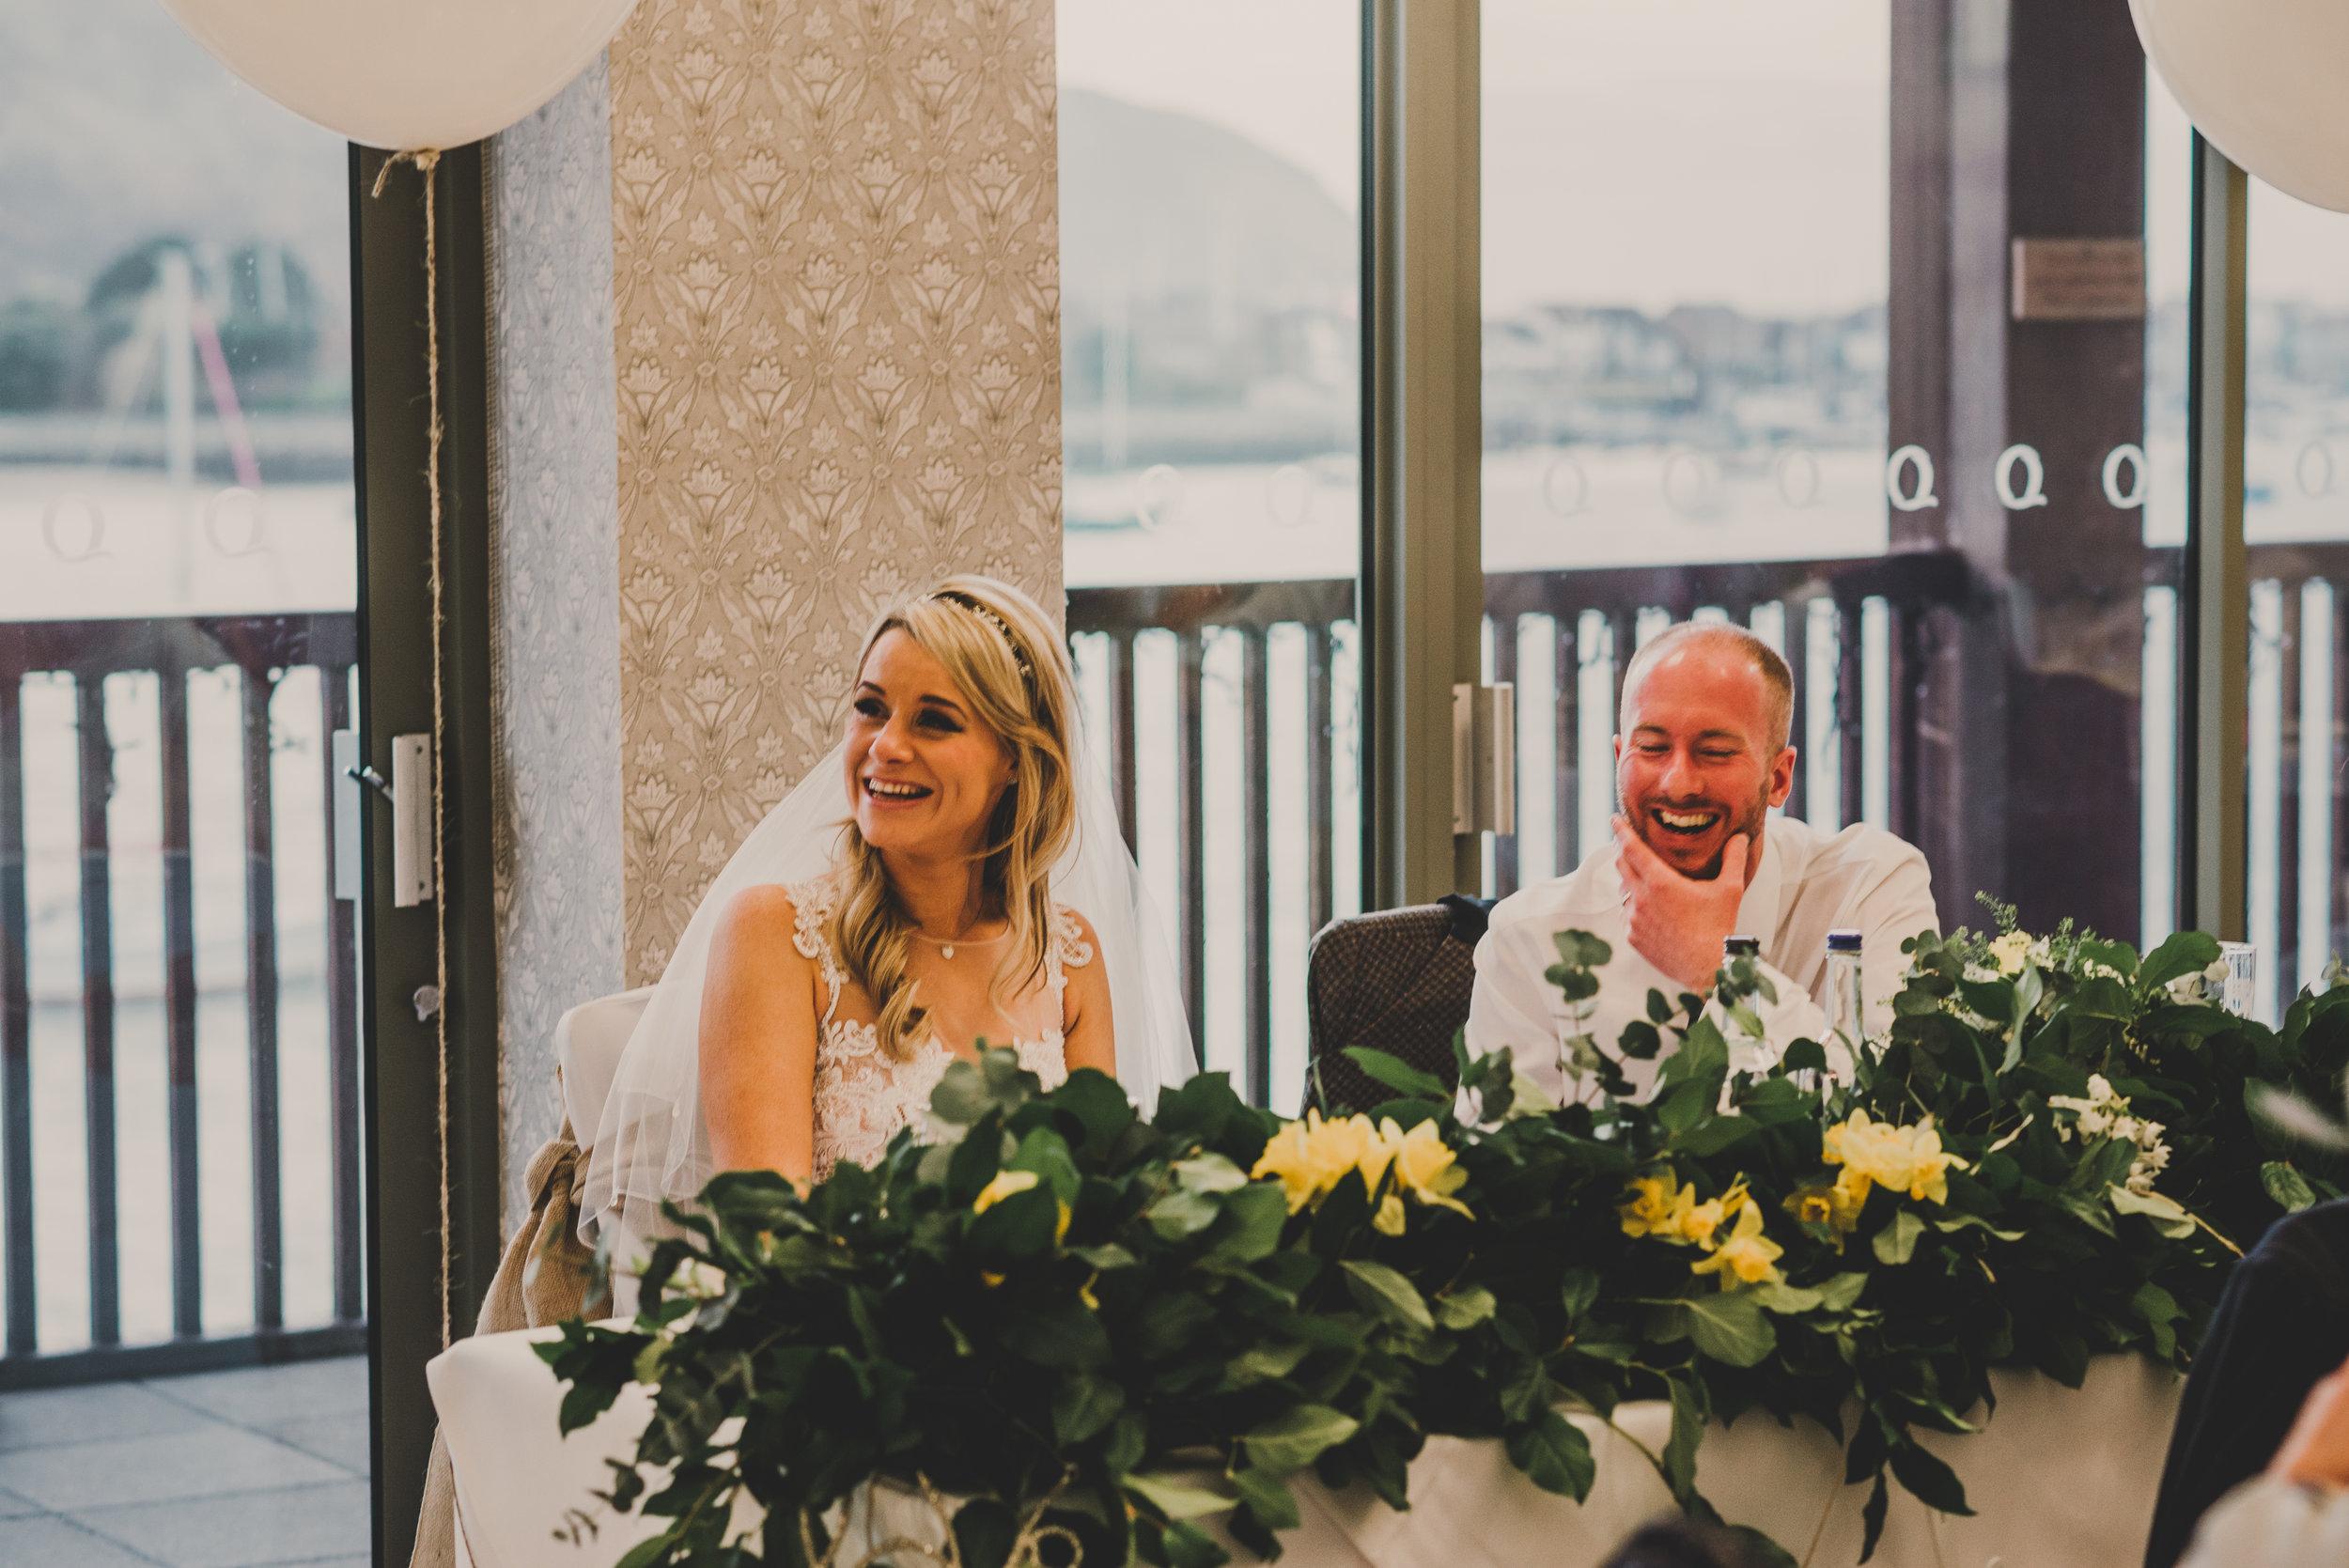 wales-wedding-photographer (51).jpg